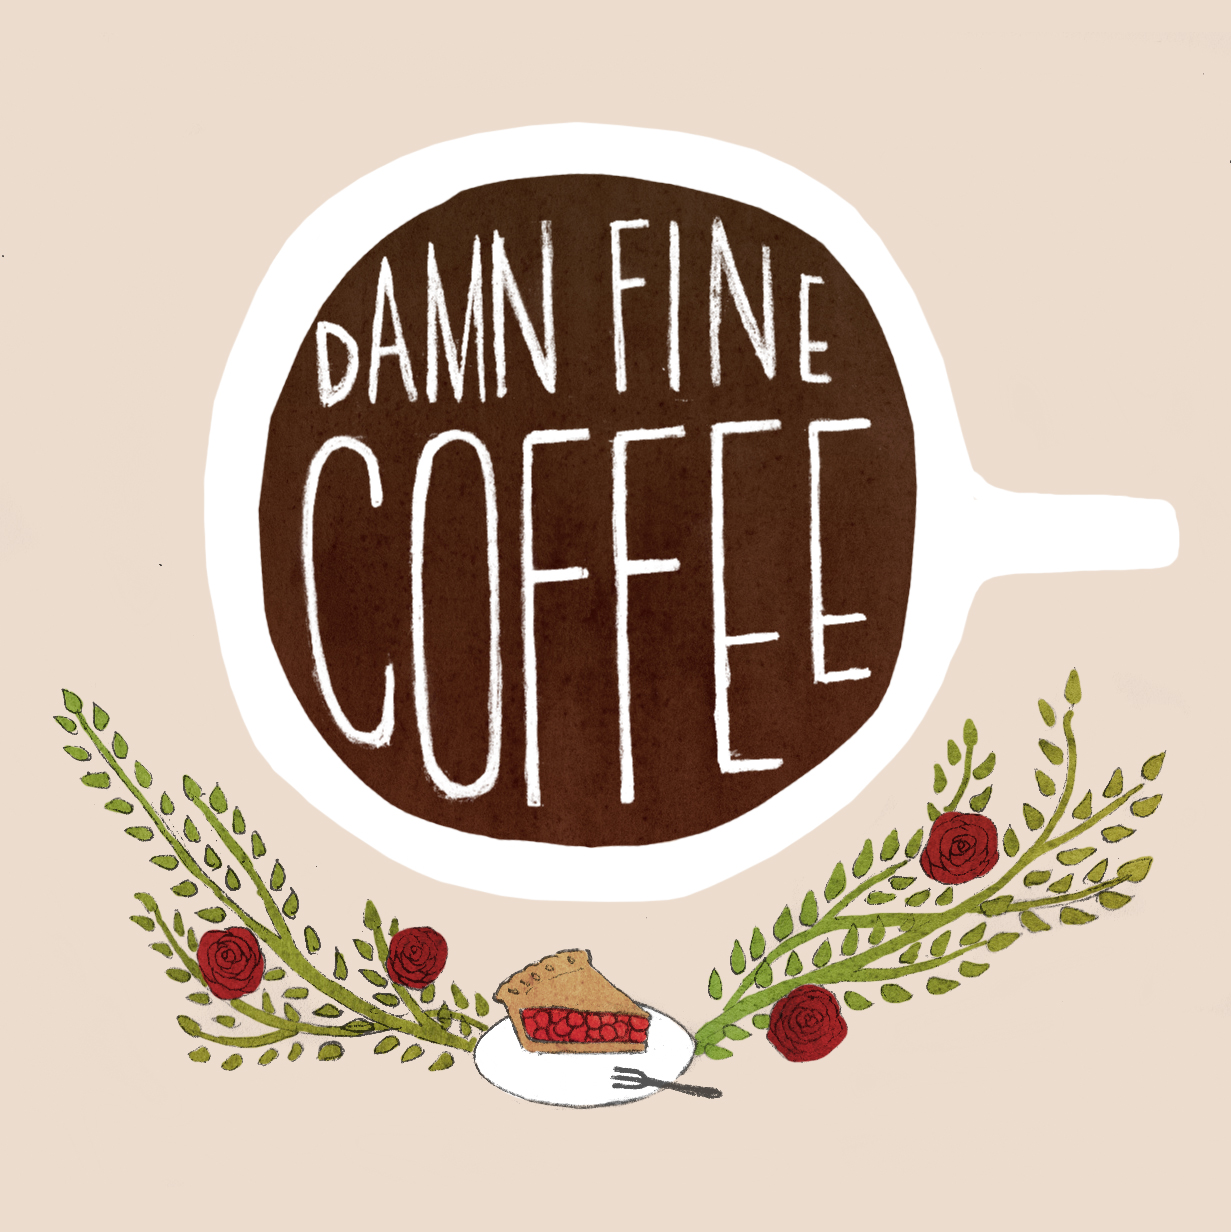 damnfinecoffee.jpg